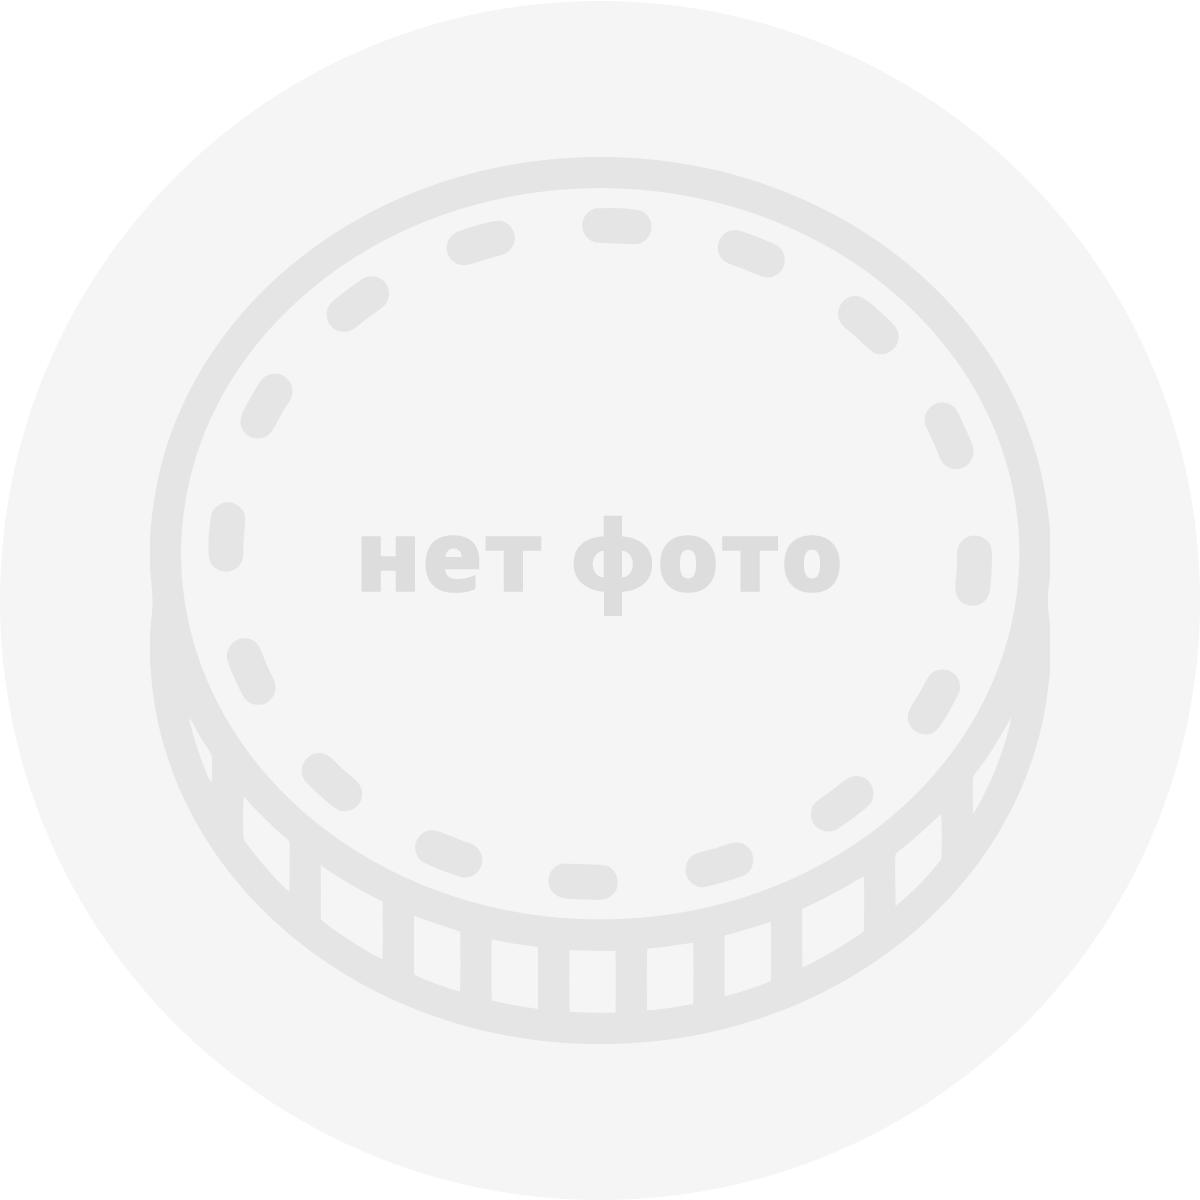 Датская Западная Индия, 1/2 цента (1905 г.)